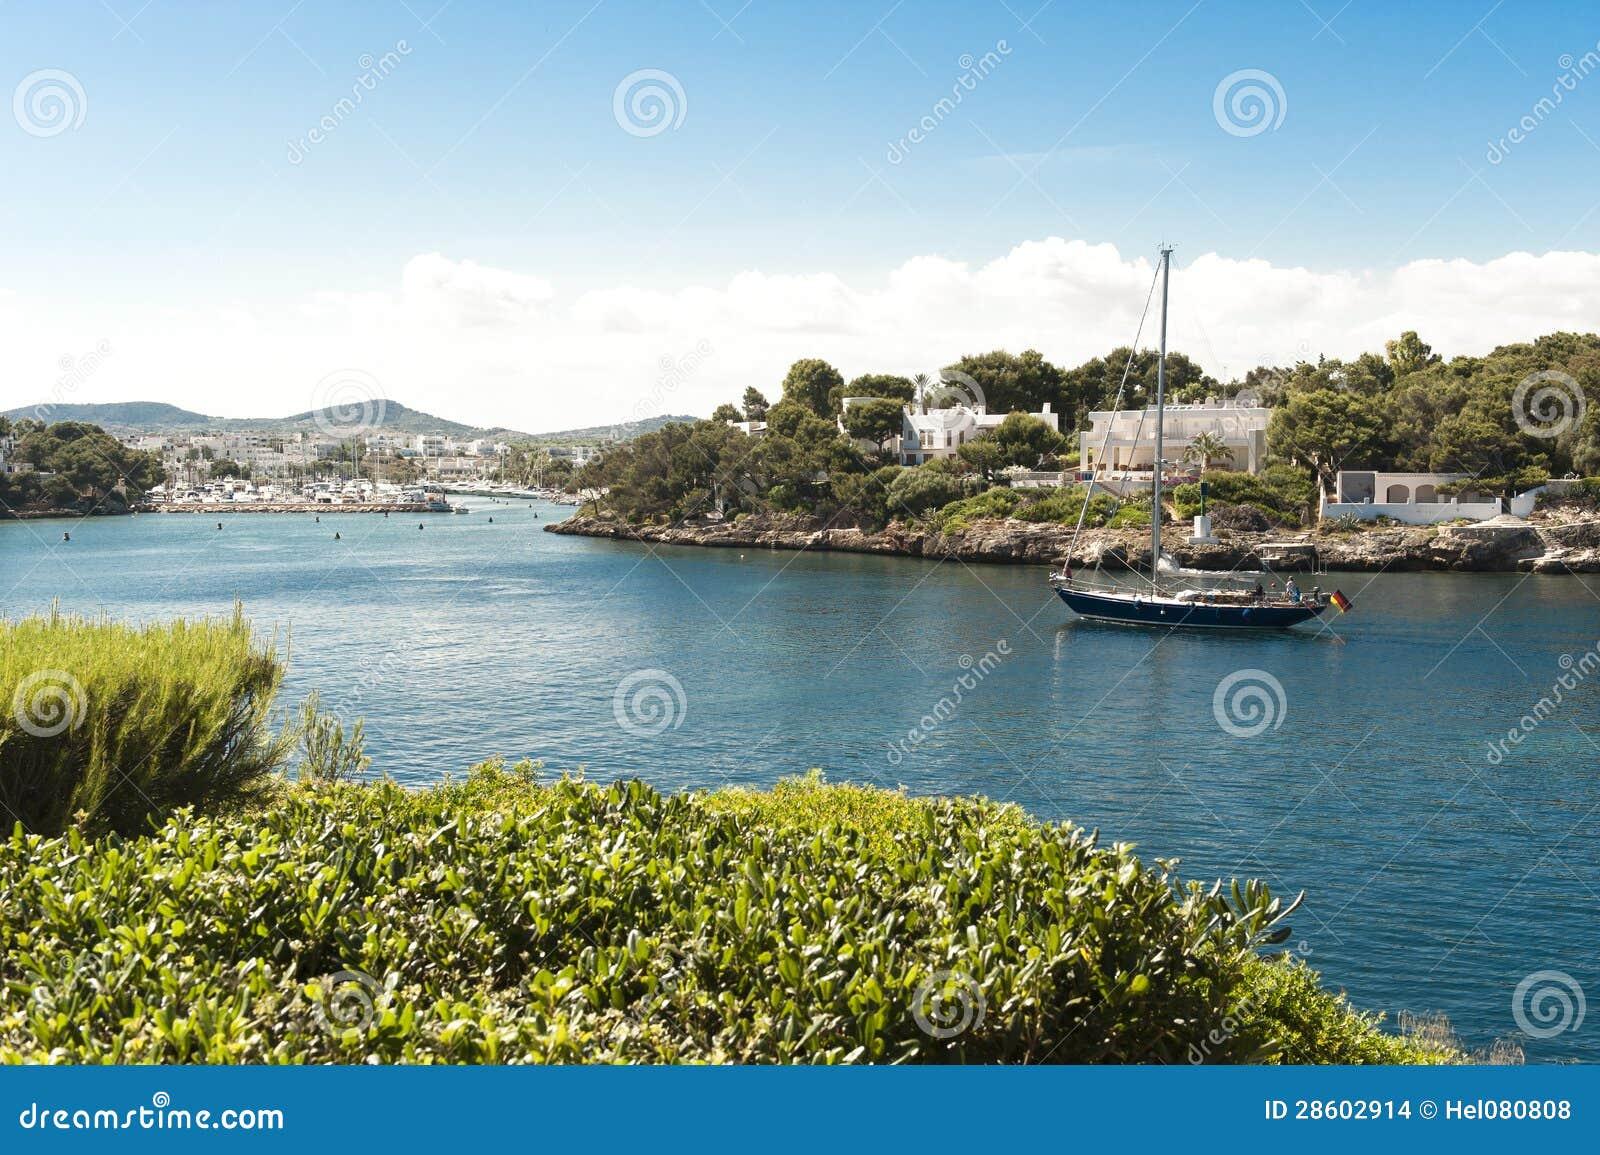 Sailing Ship reaches Harbour in Majorca